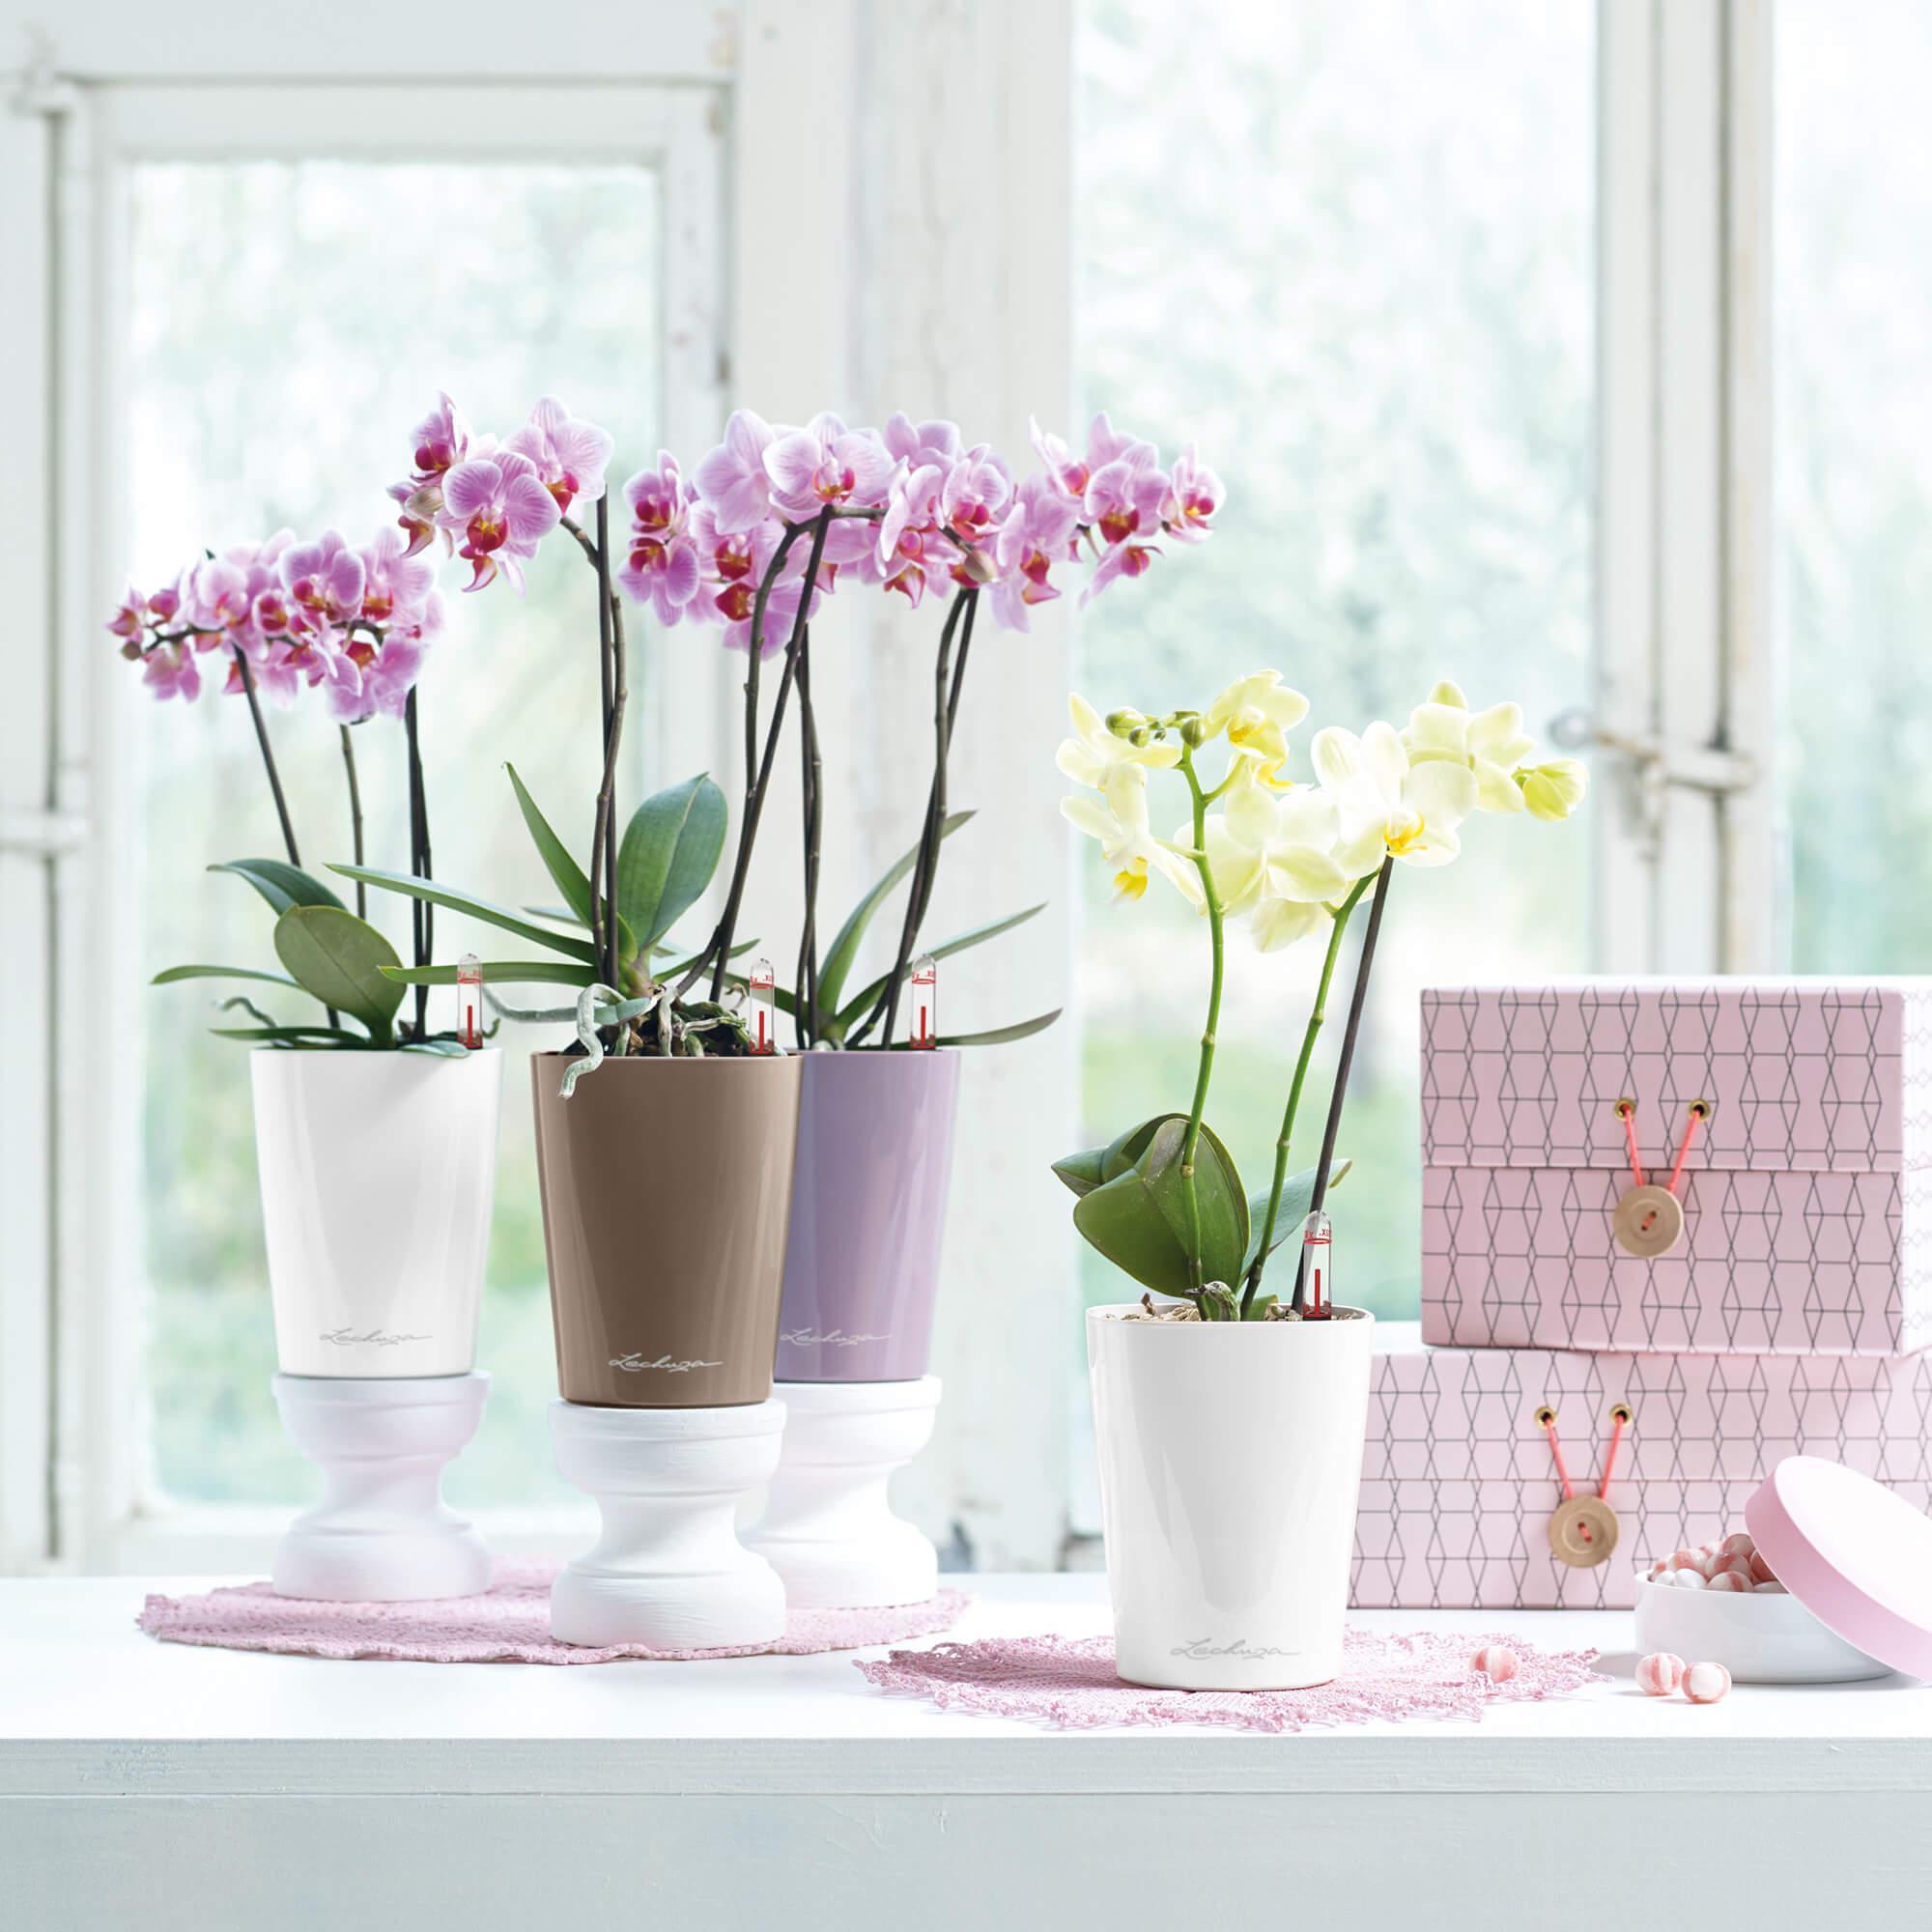 le_tw-orchideen_minideltini_bunt